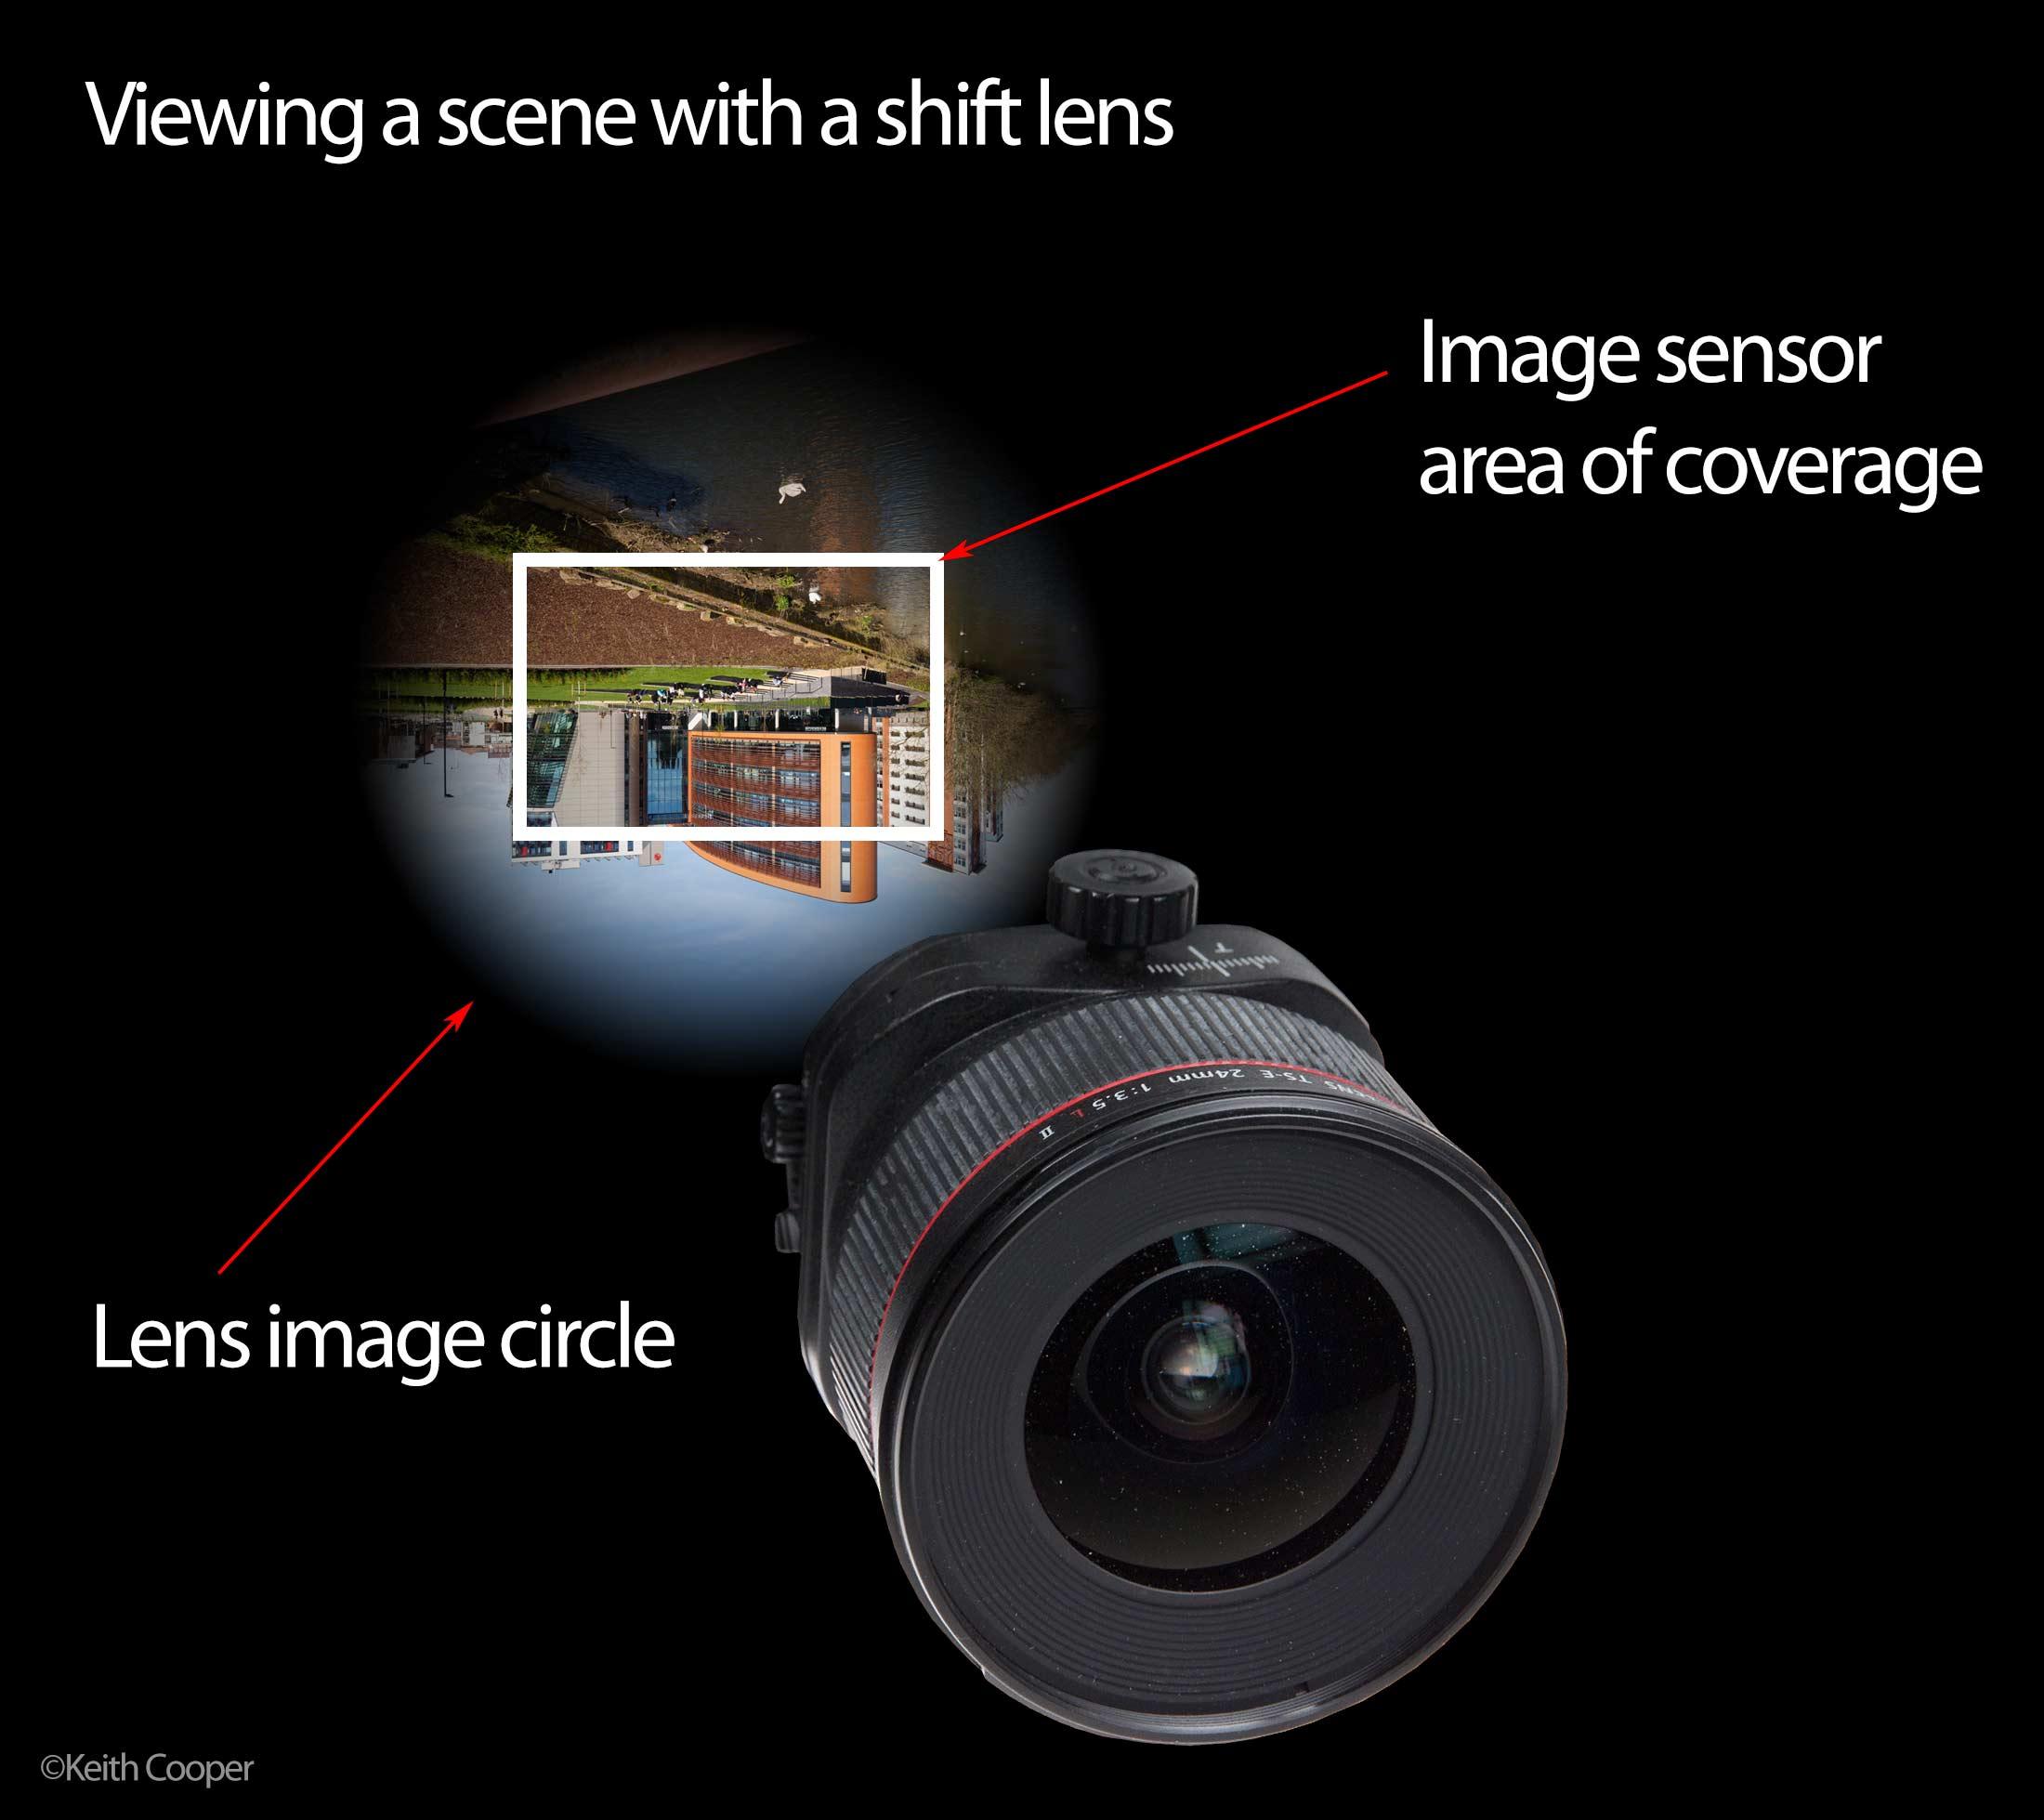 image circle and sensor